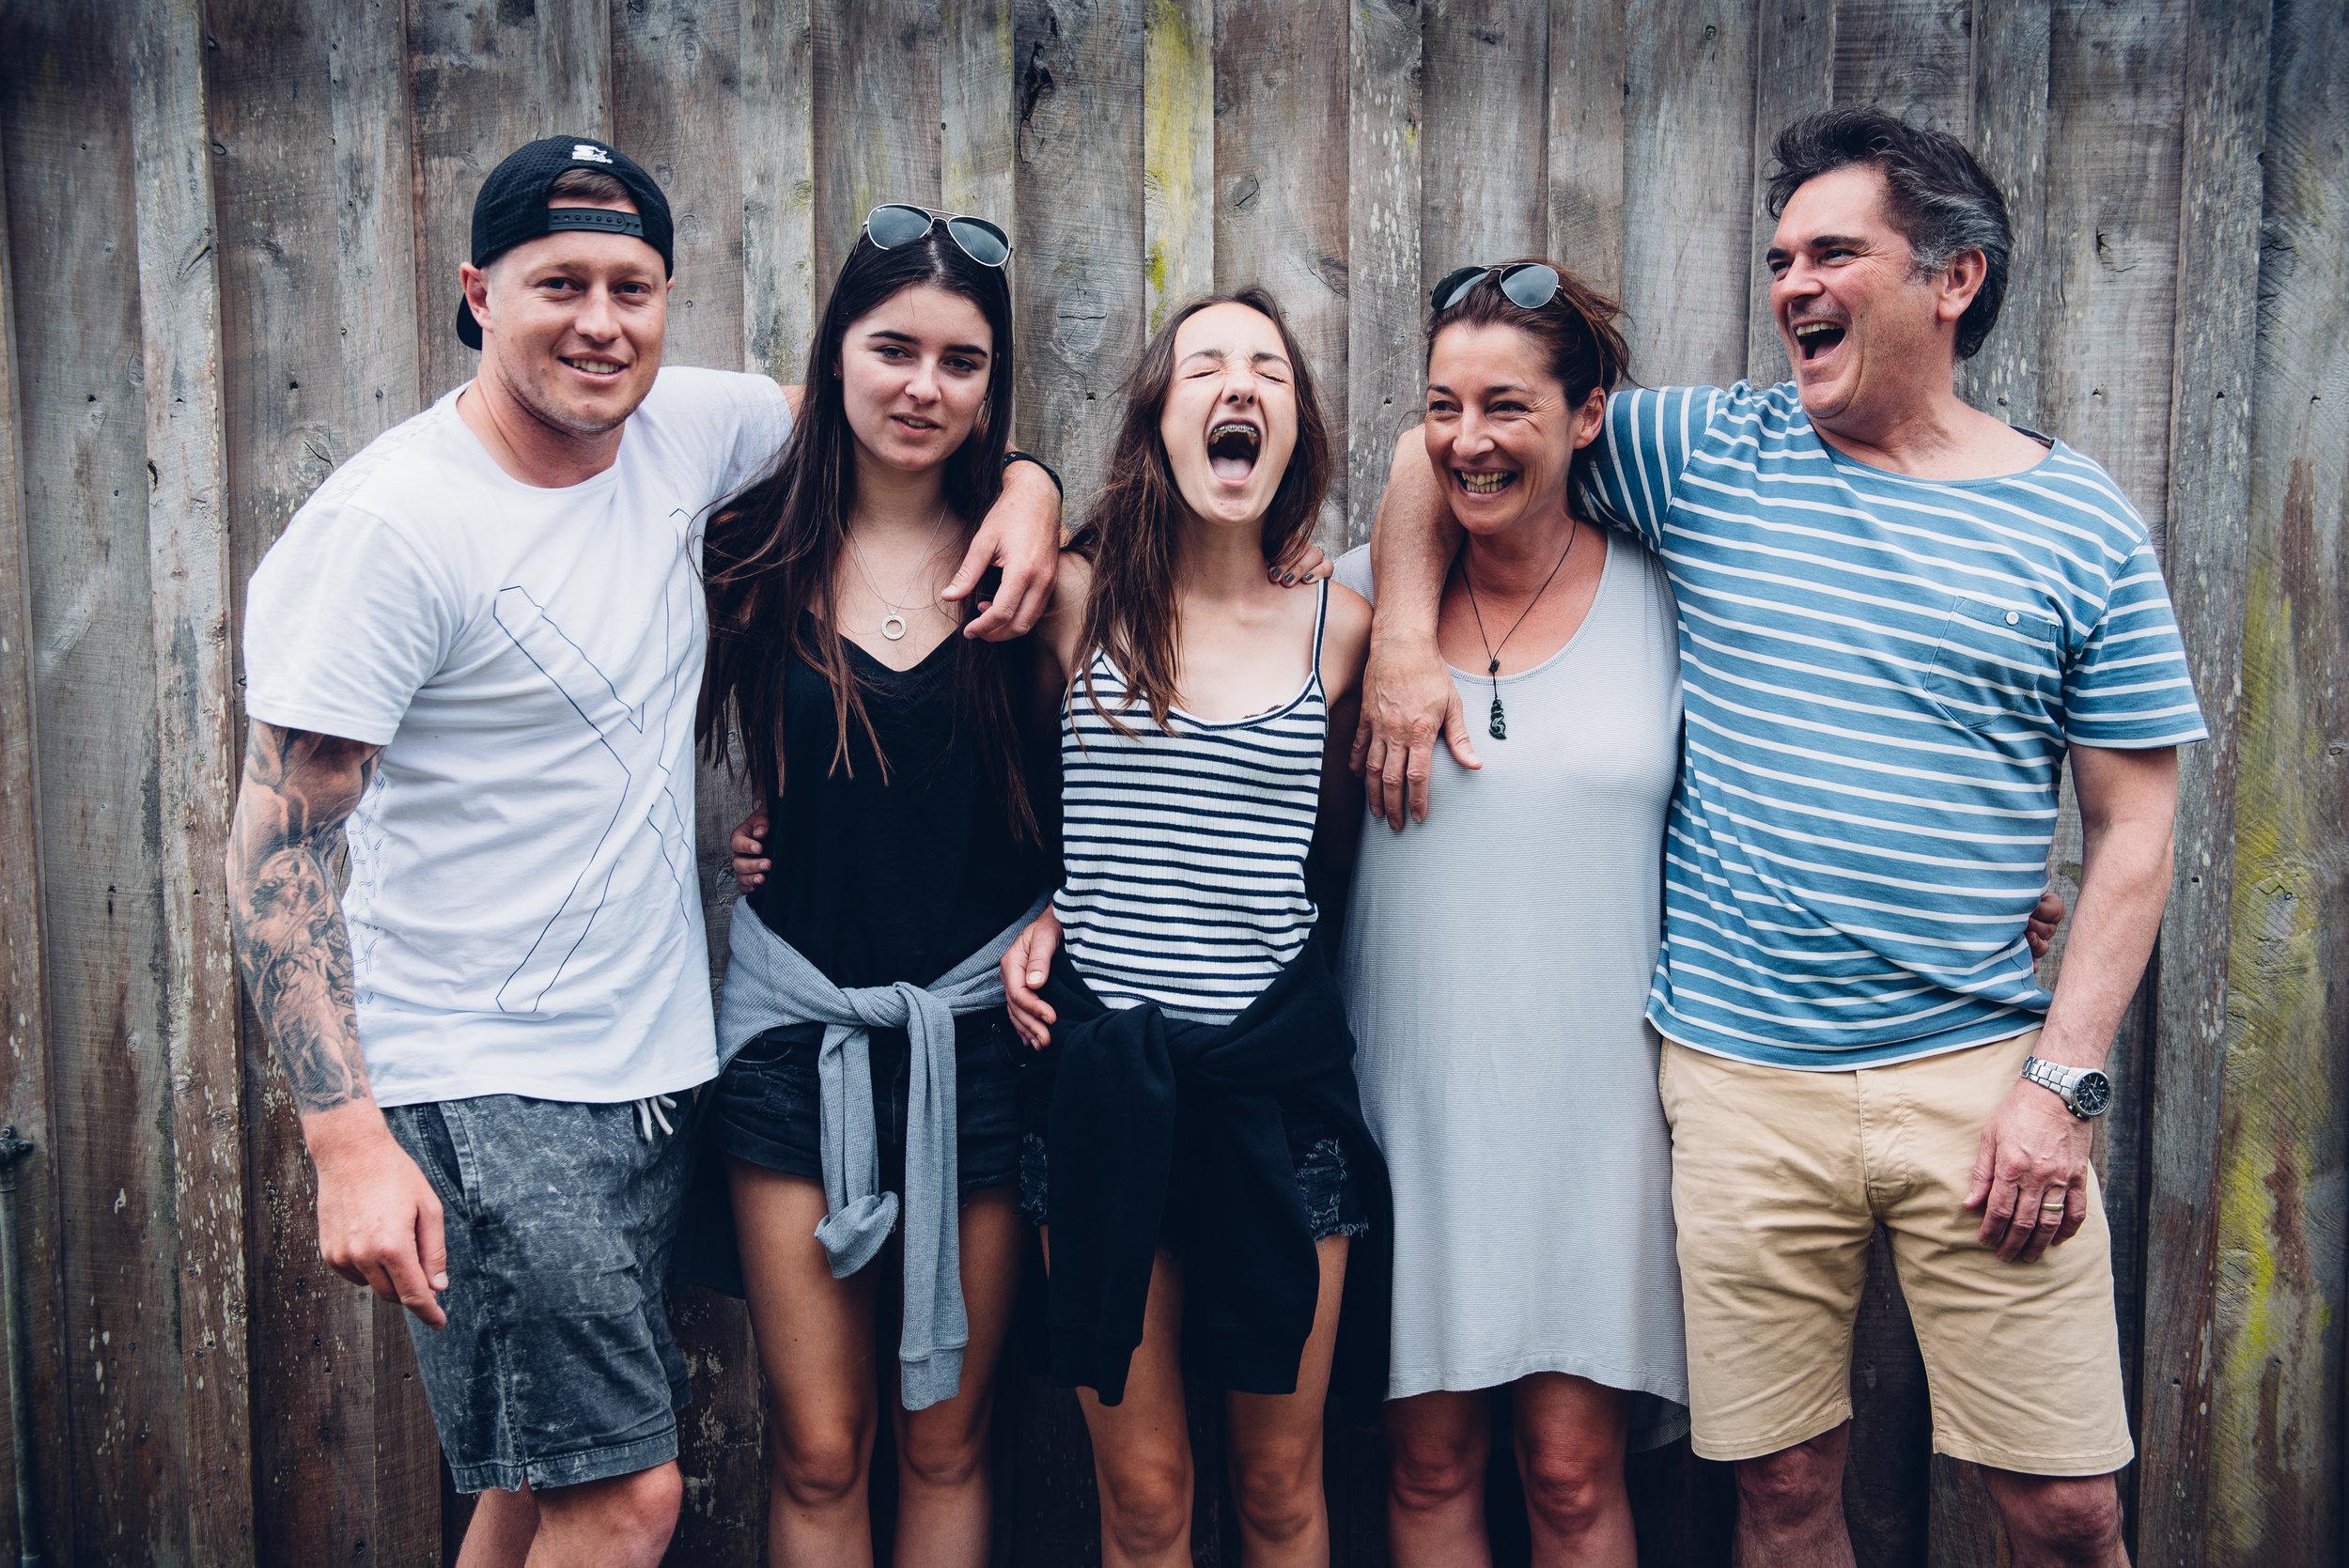 Auckland Family portrait photographer, award winning photographer